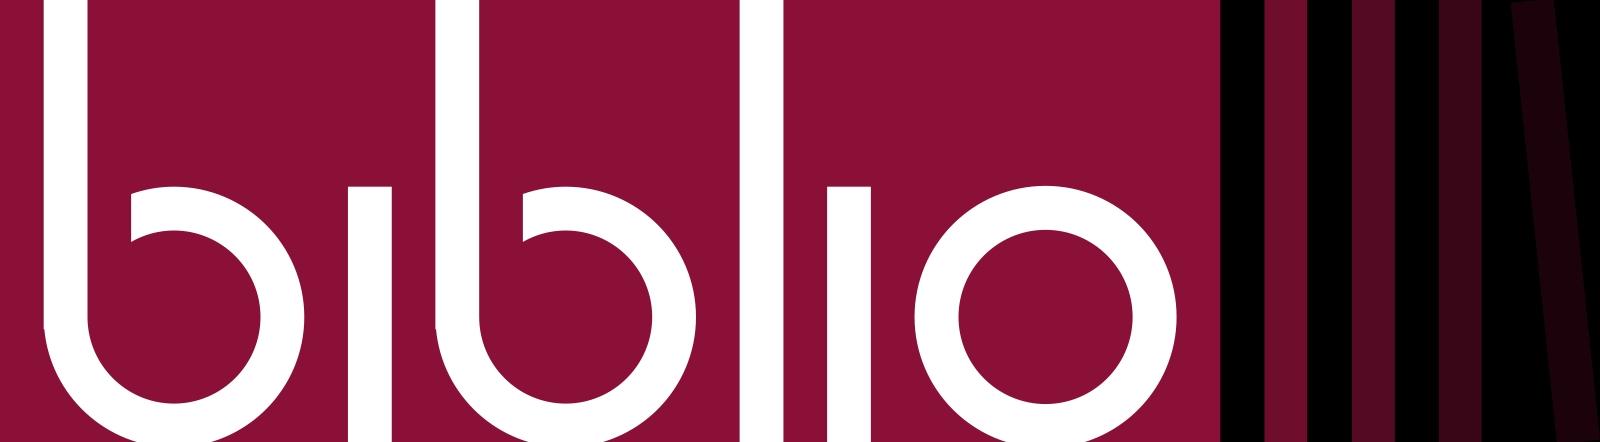 logo project BIBLIO